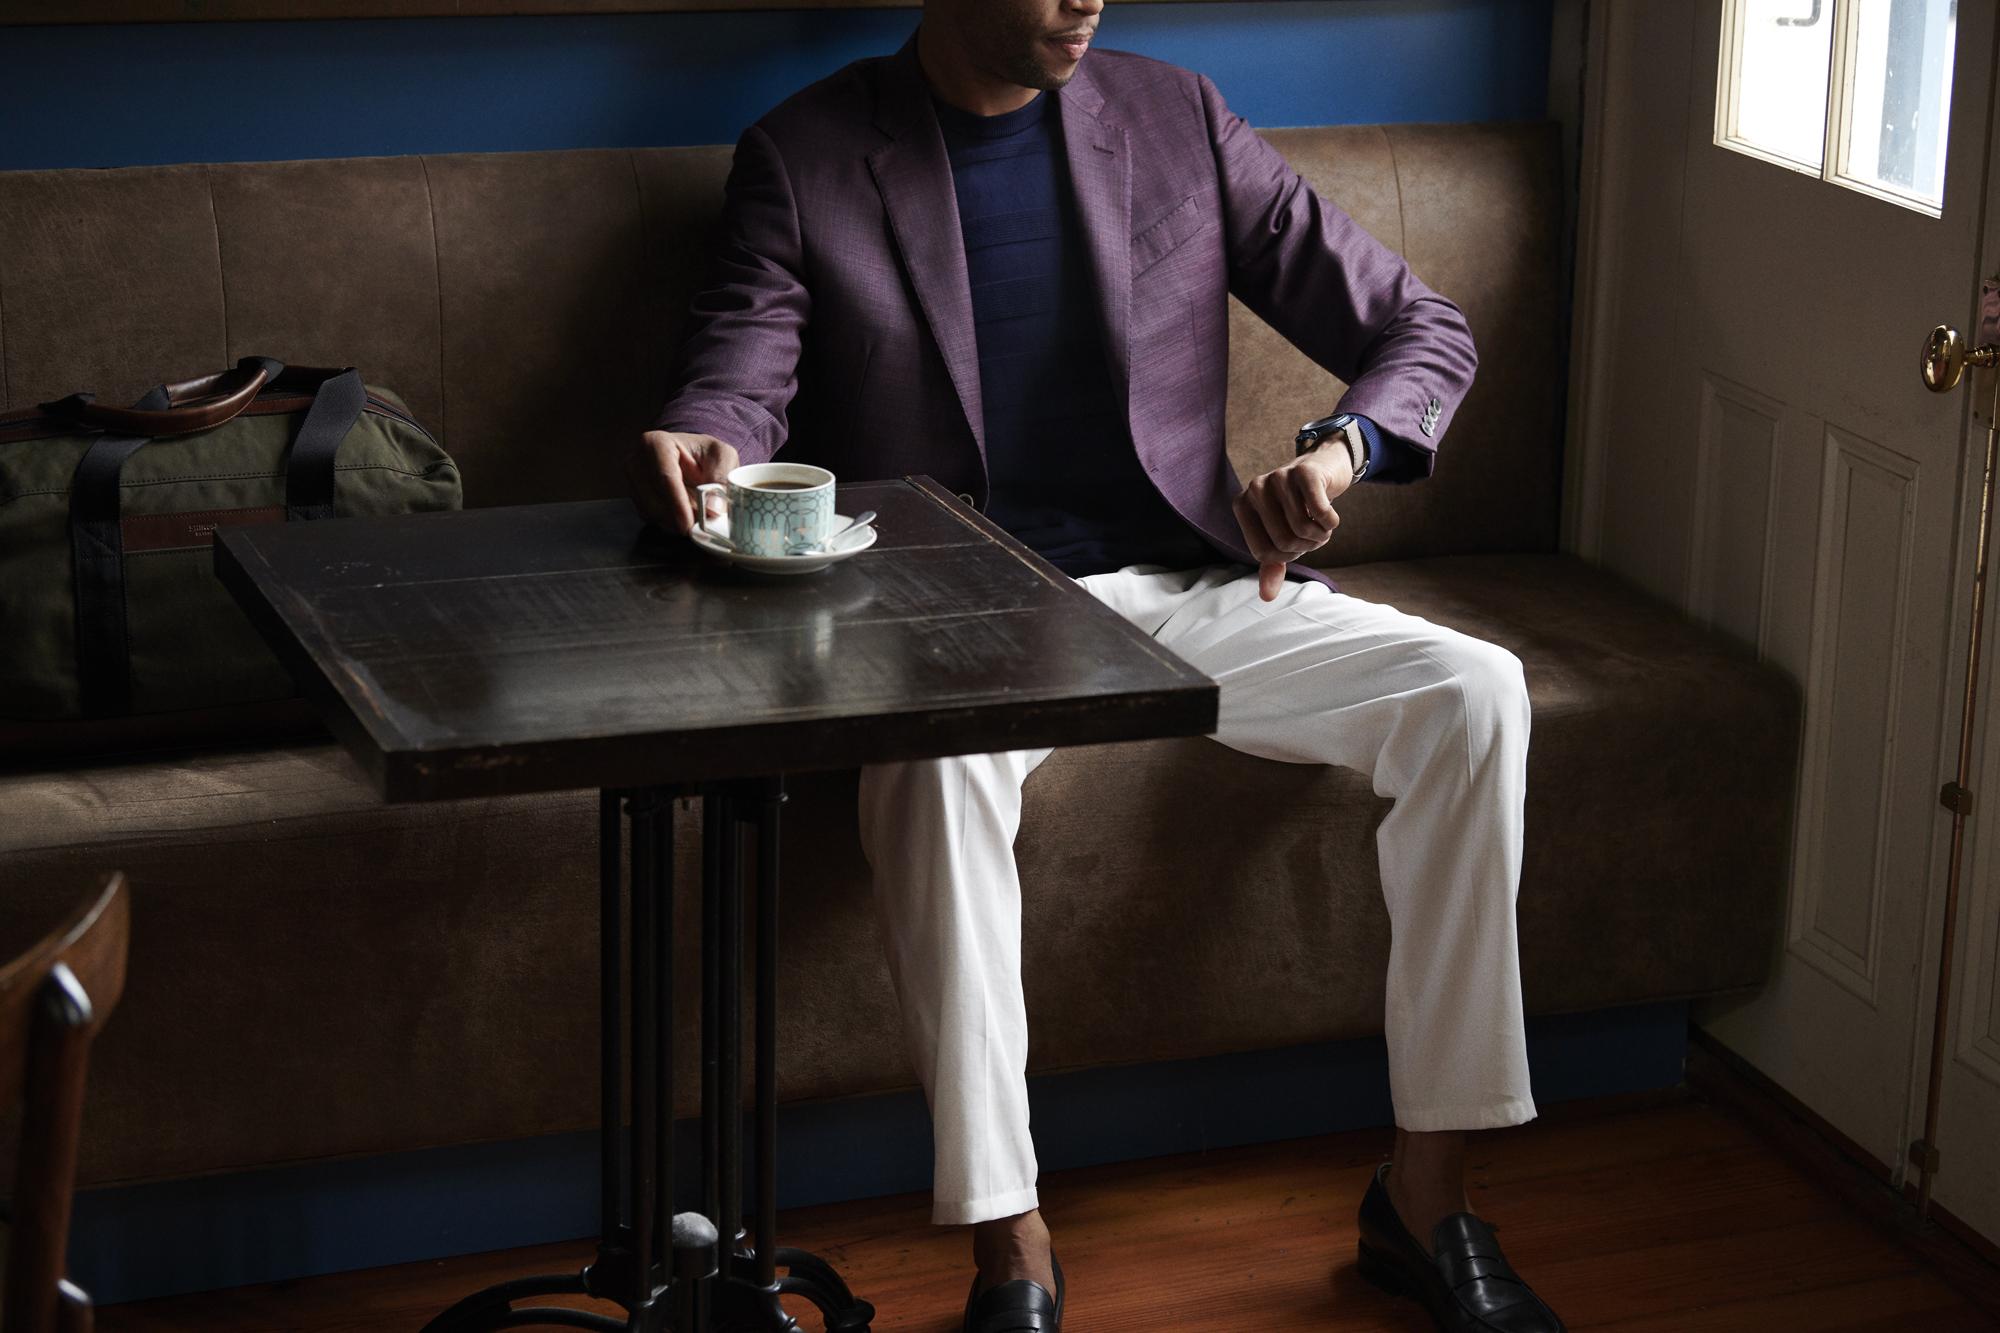 Trombone Shorty enjoying a cup of tea in Emporio Armani and Shinola